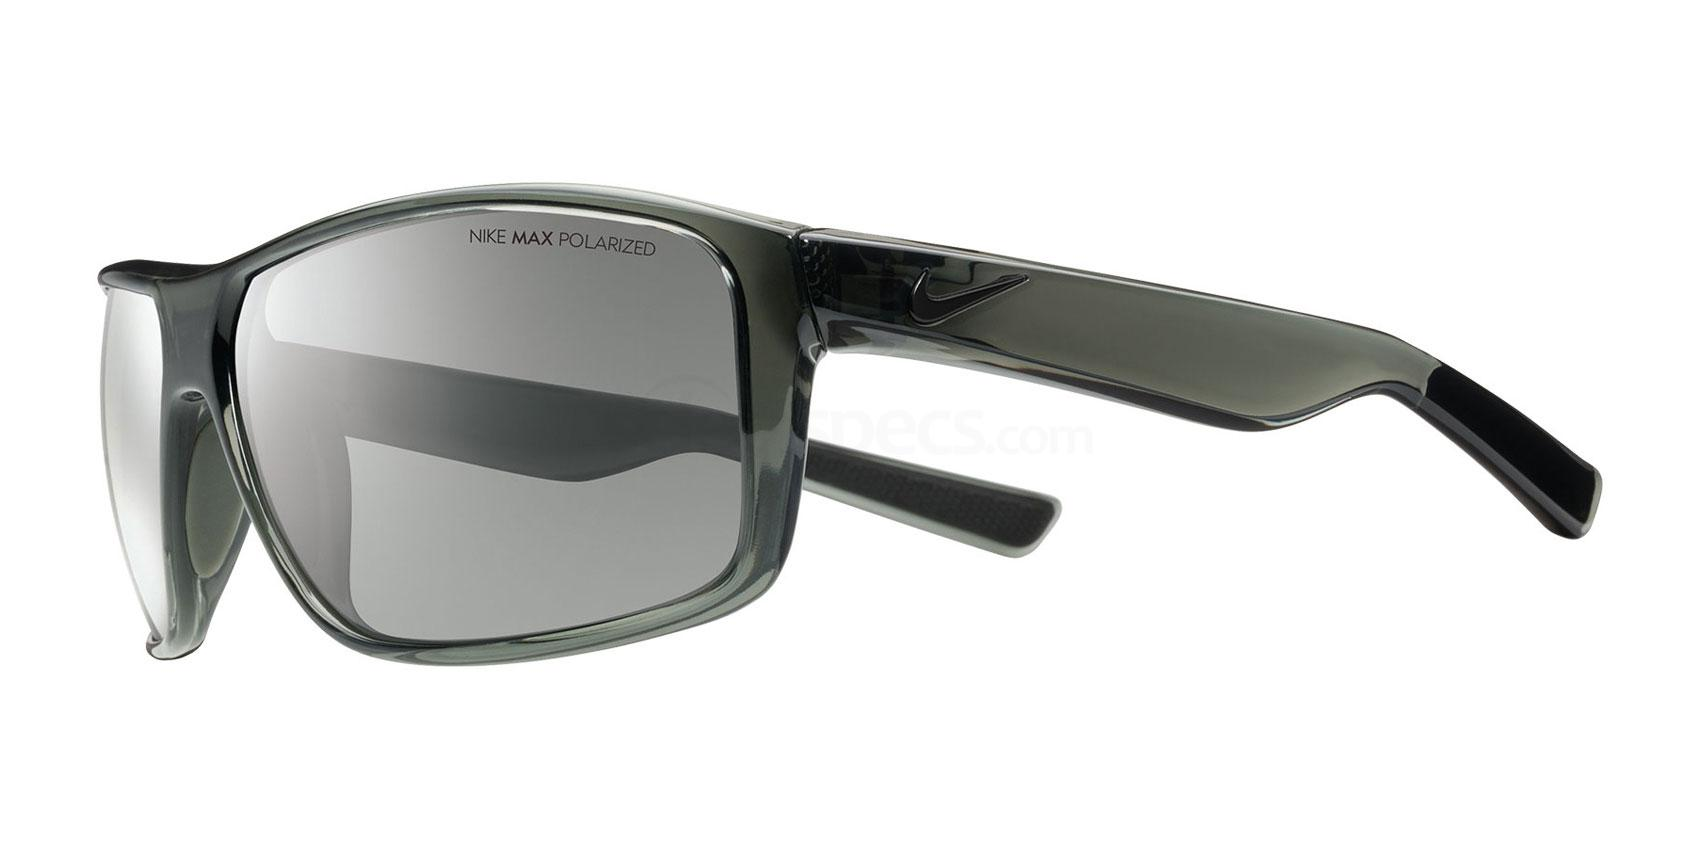 011 NIKE PREMIER 8.0 P EV0793 Sunglasses, Nike